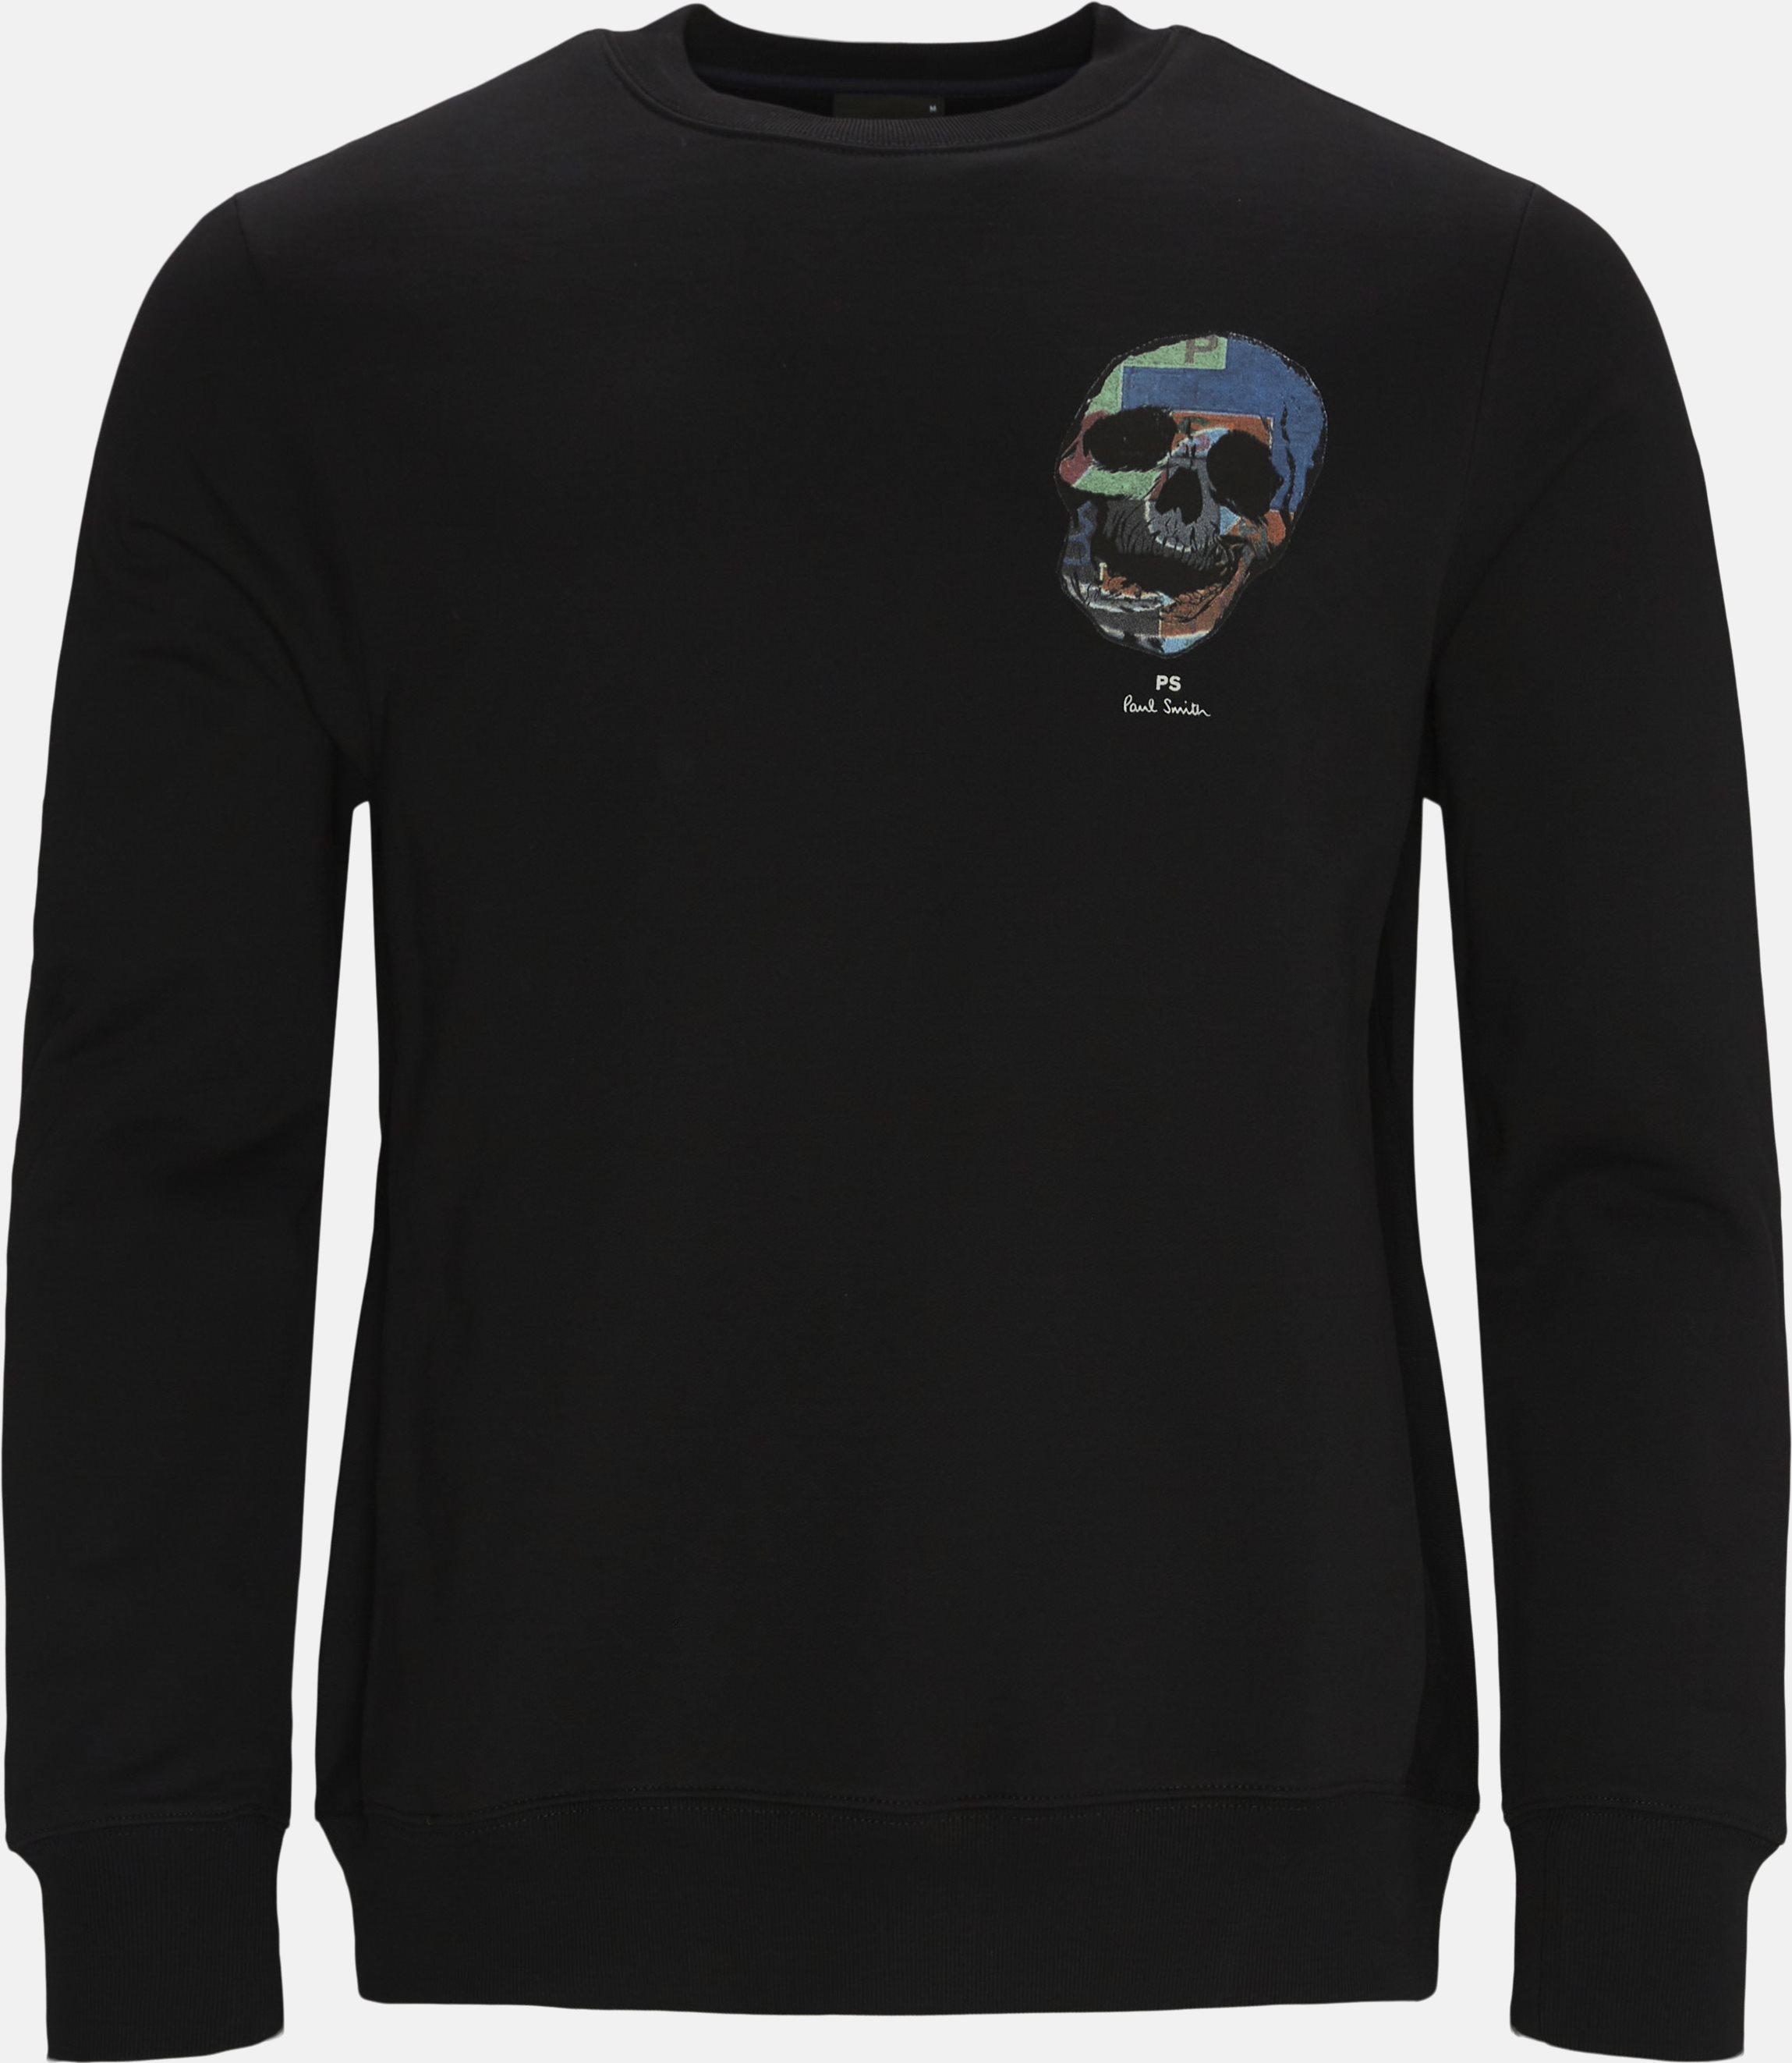 Skull Sweatshirt - Sweatshirts - Regular fit - Sort